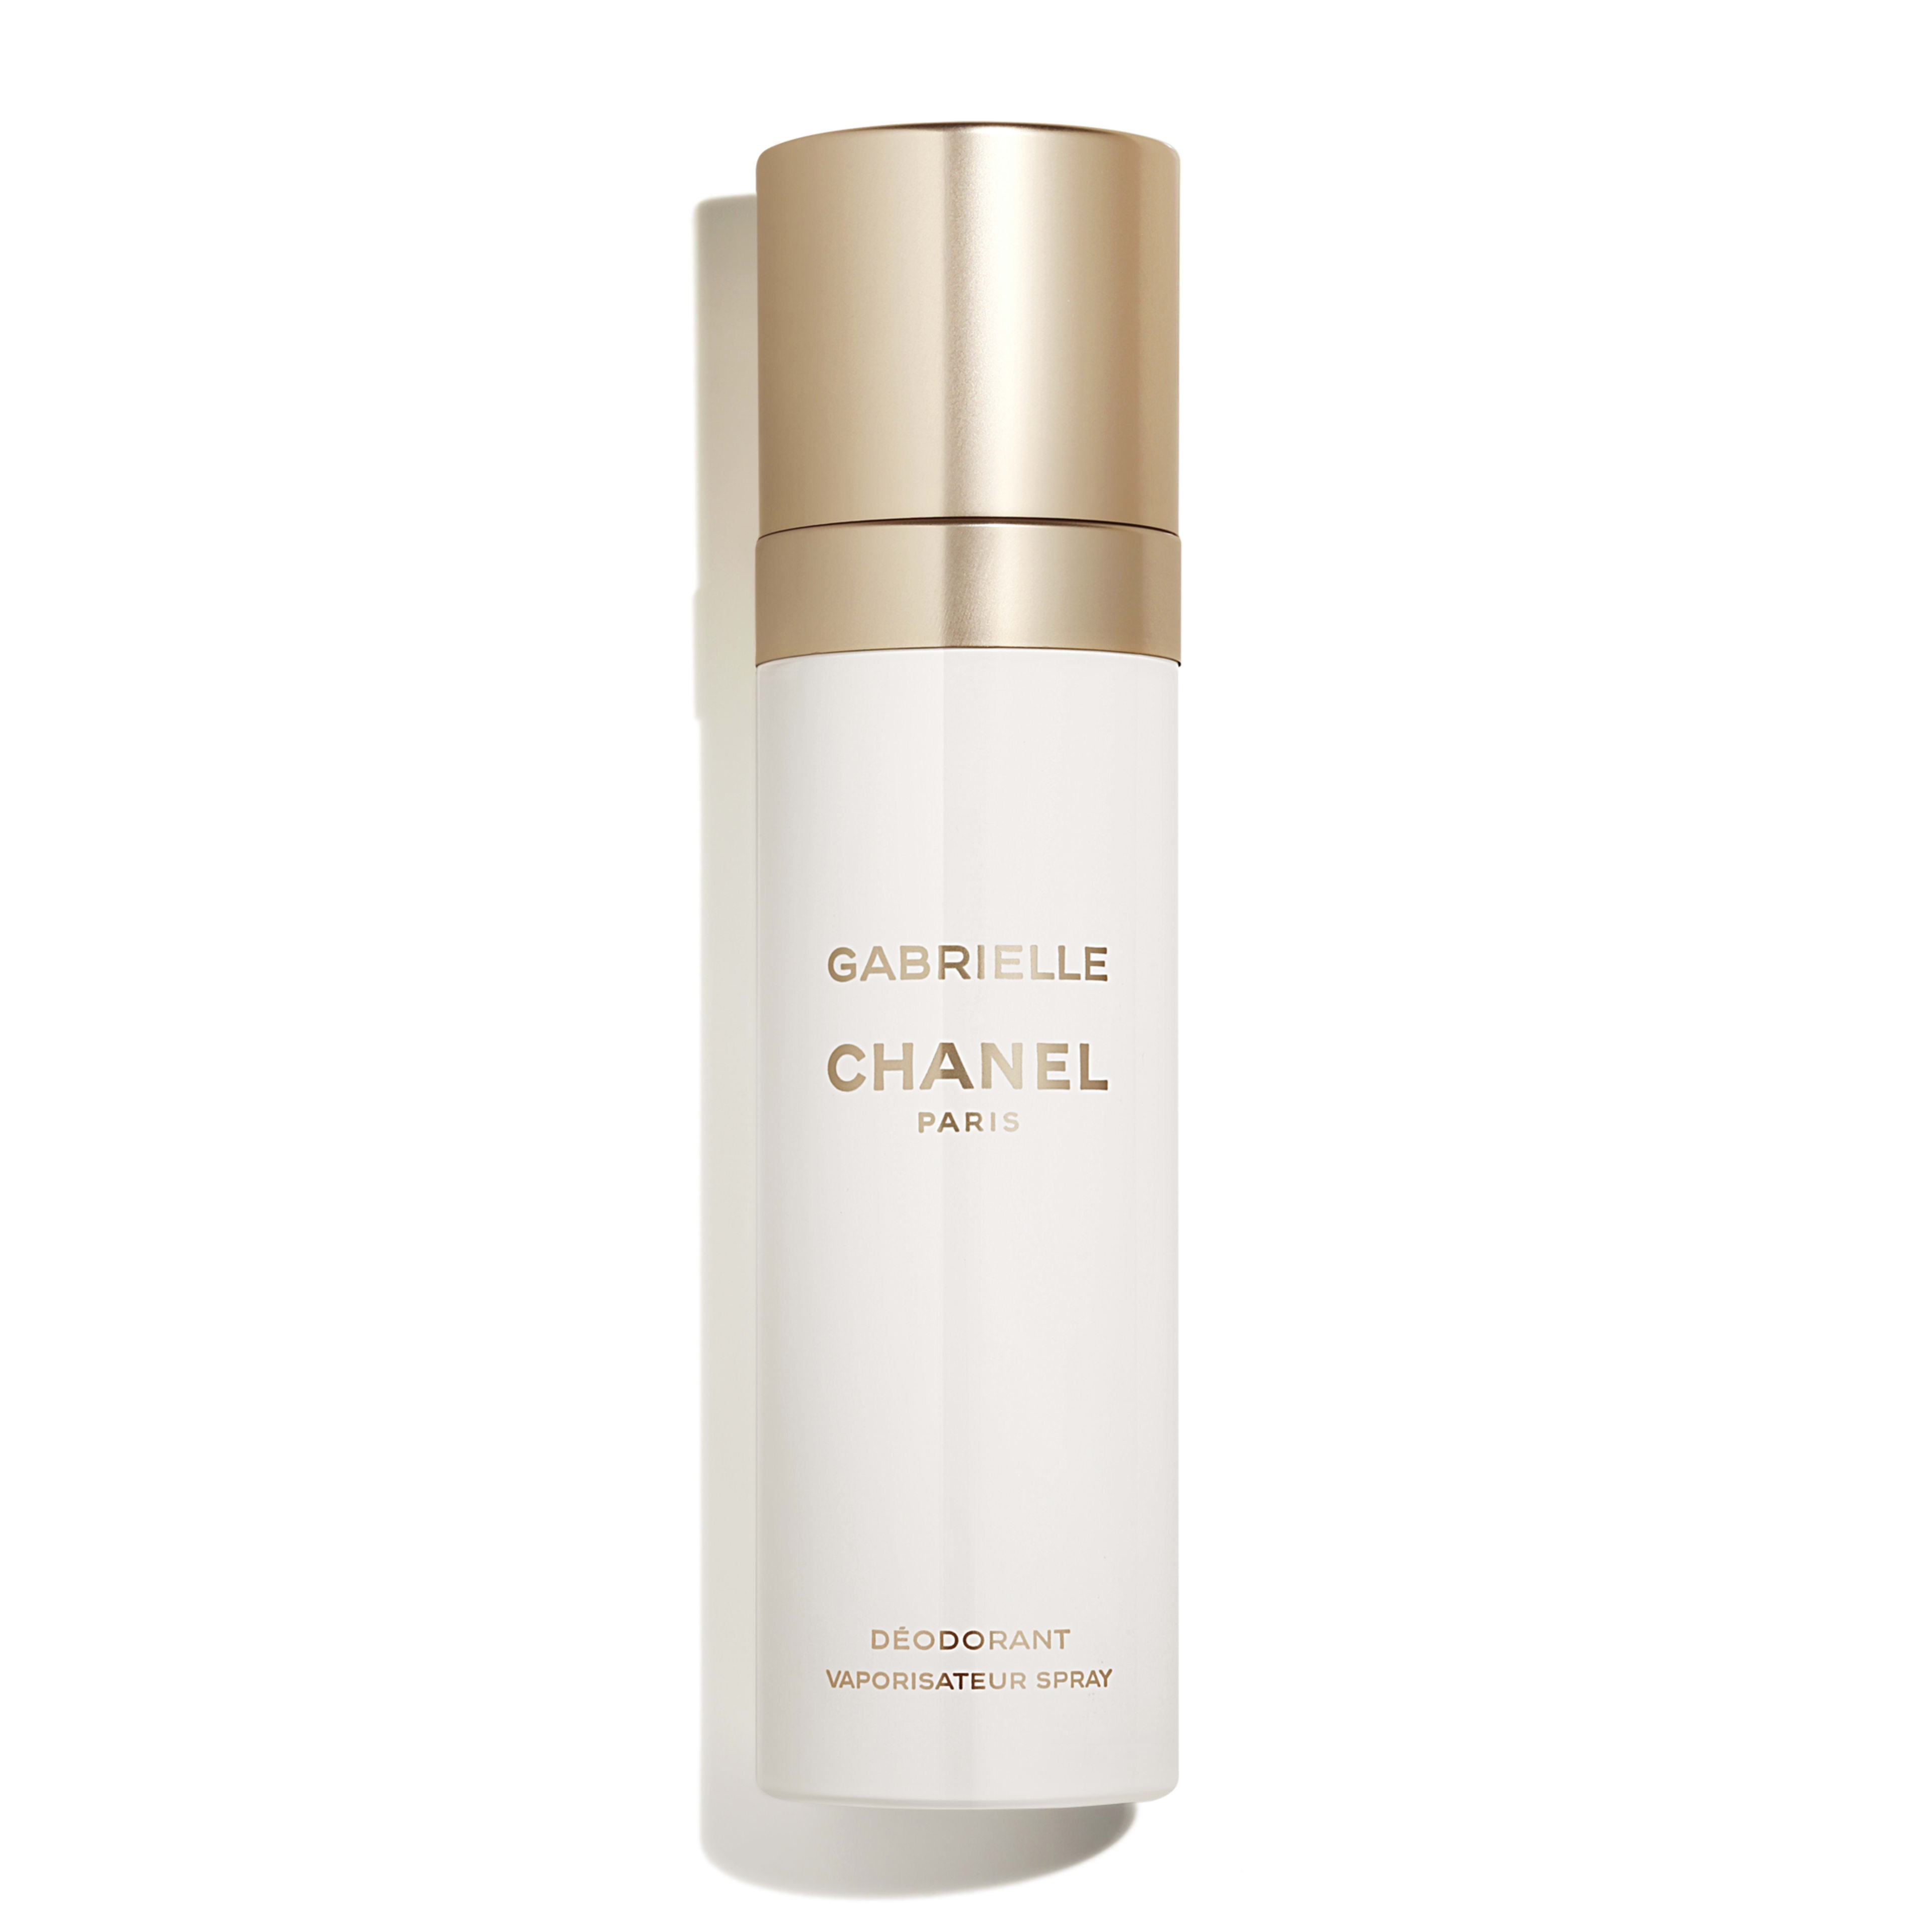 Chanel Gabrielle Deodorant pro ženy 100 ml